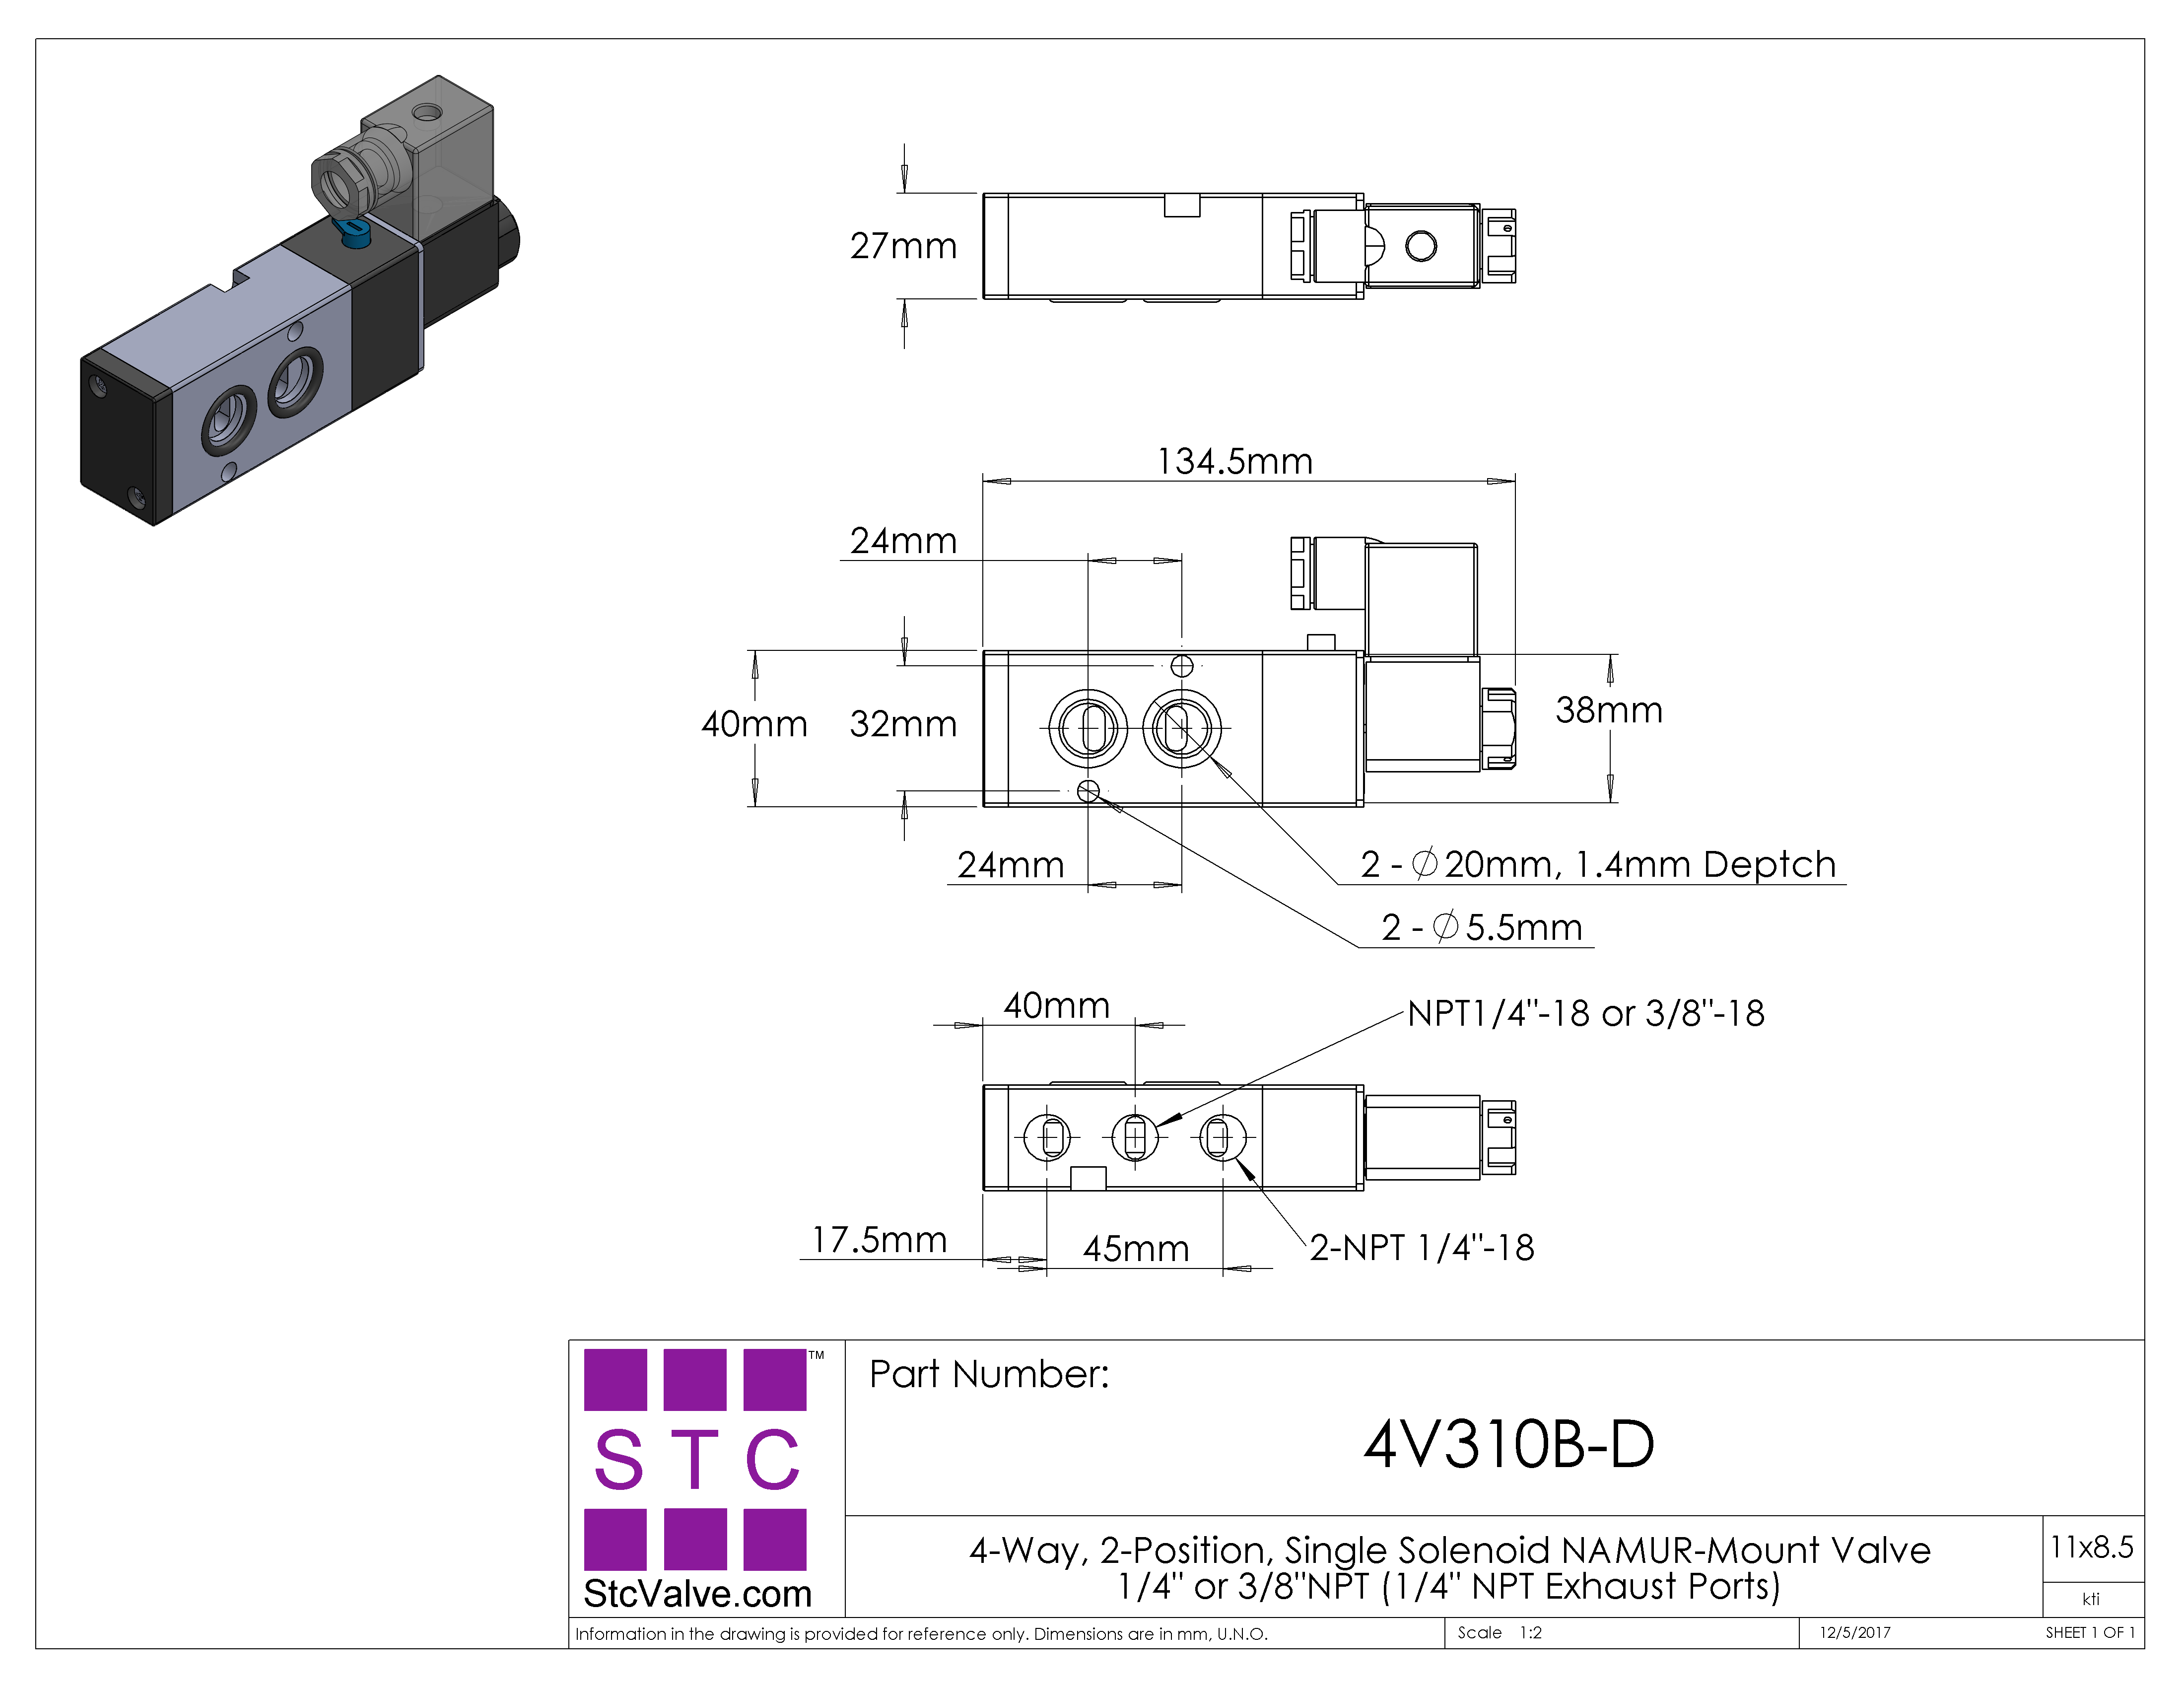 4V310B: 4-Way, 2-Position NAMUR Directional Solenoid Valve